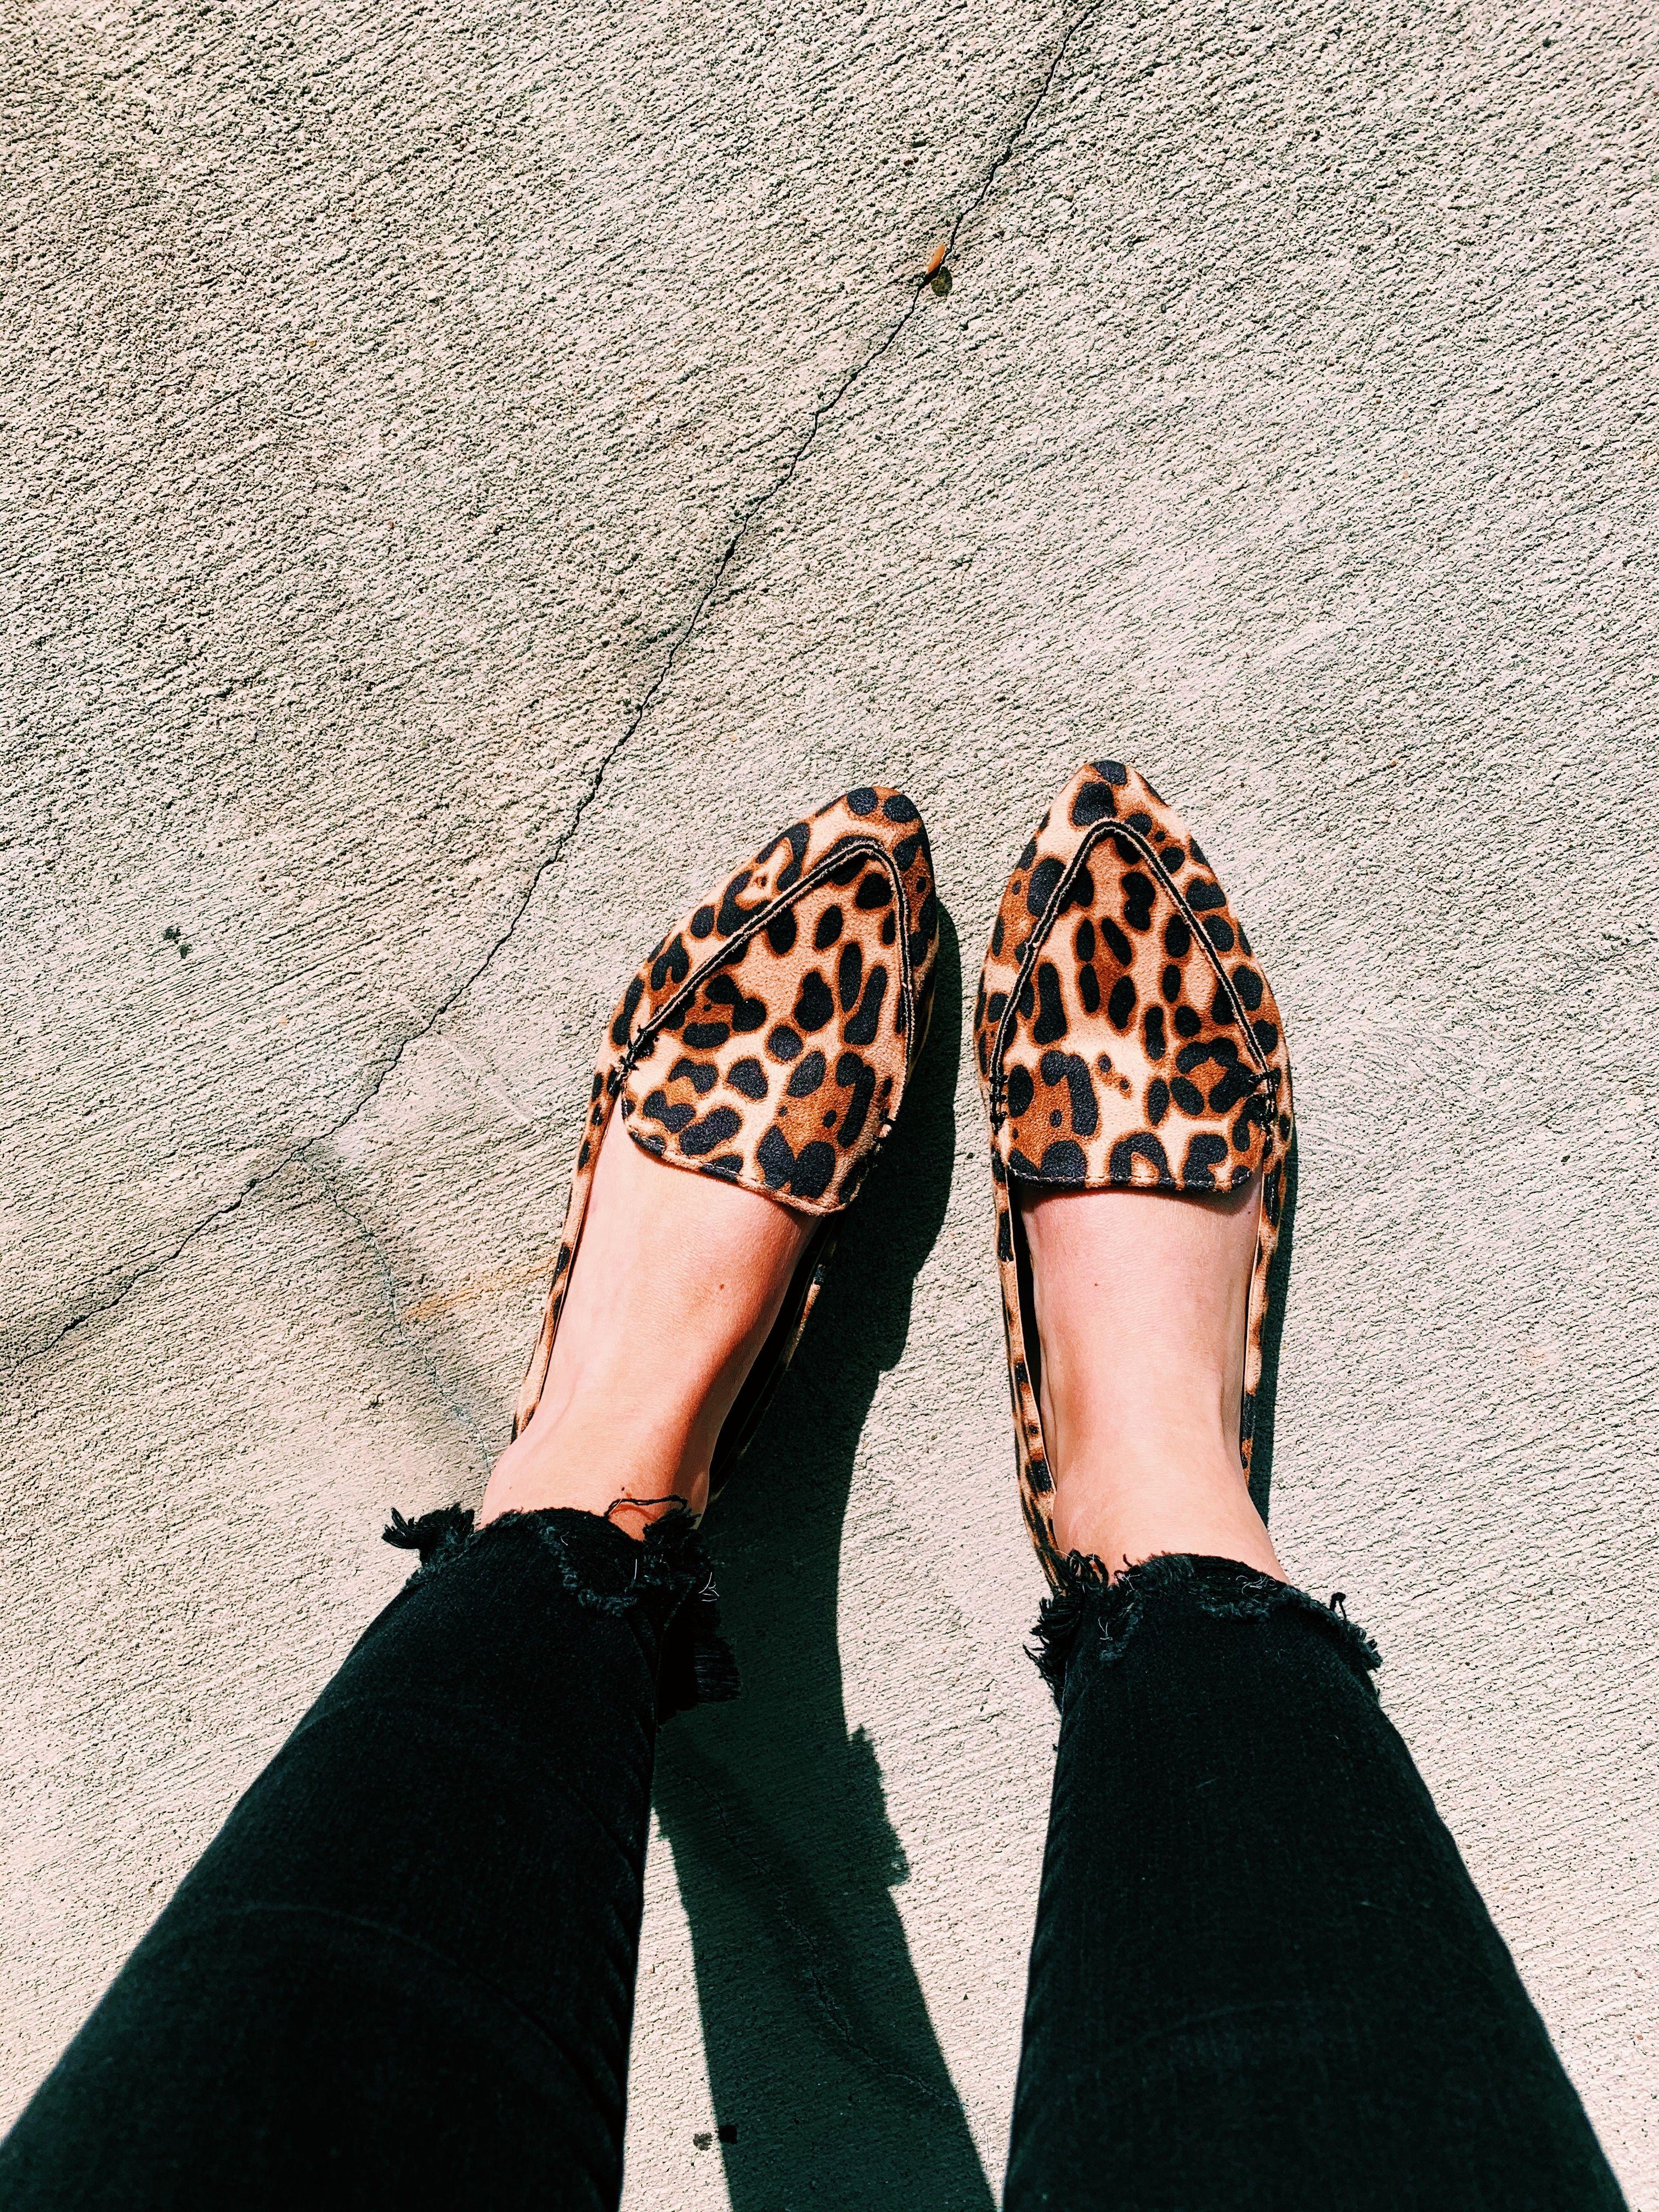 Leopard print shoes outfit